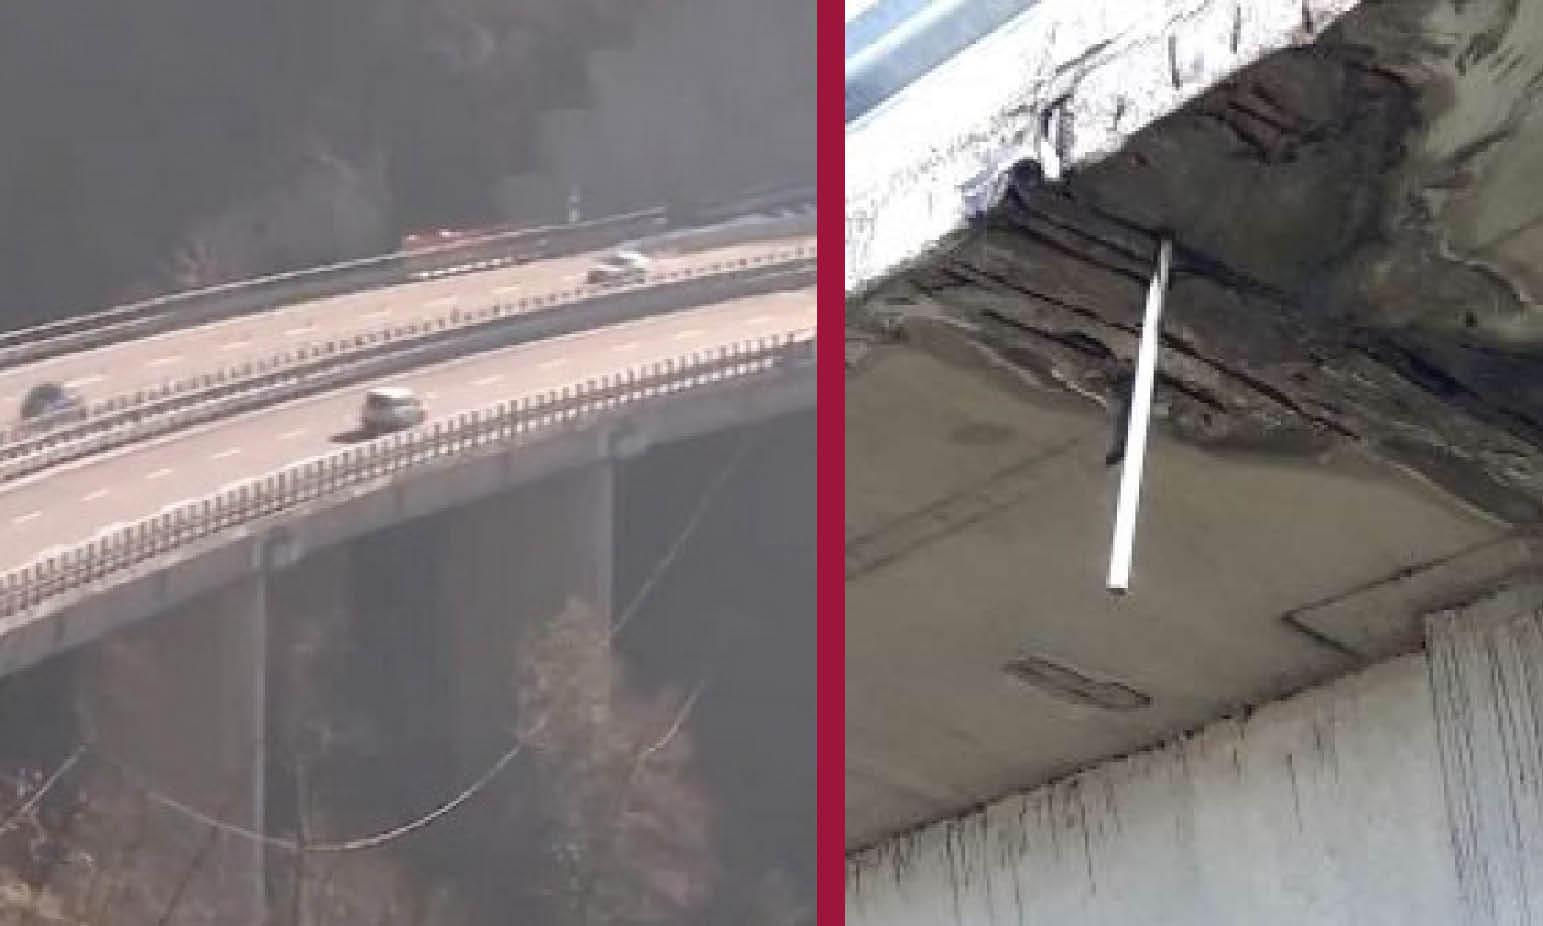 AUTOSTRADE, INTERCETTAZIONI SHOCK: «I report sui ponti? Te li inventi…»